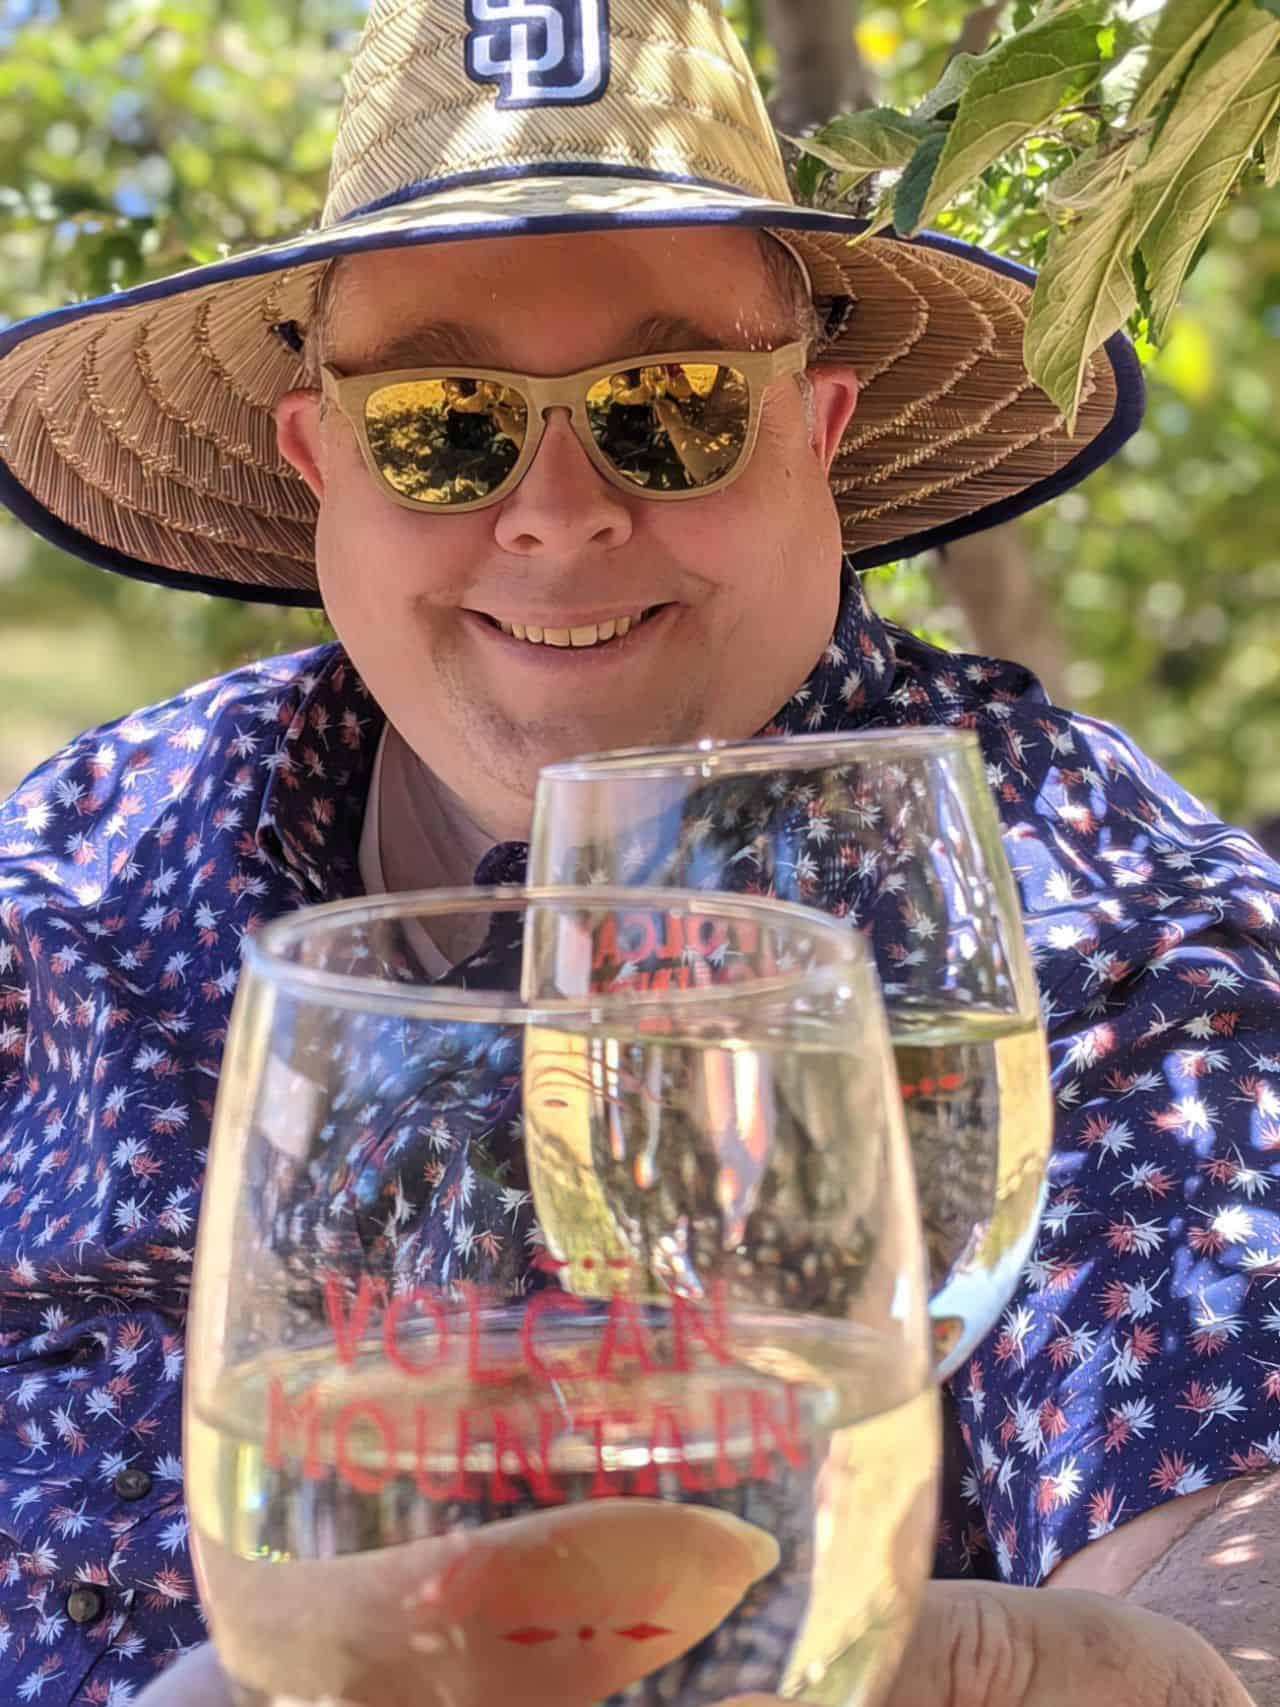 cheers to great wine and sunshine upscaled